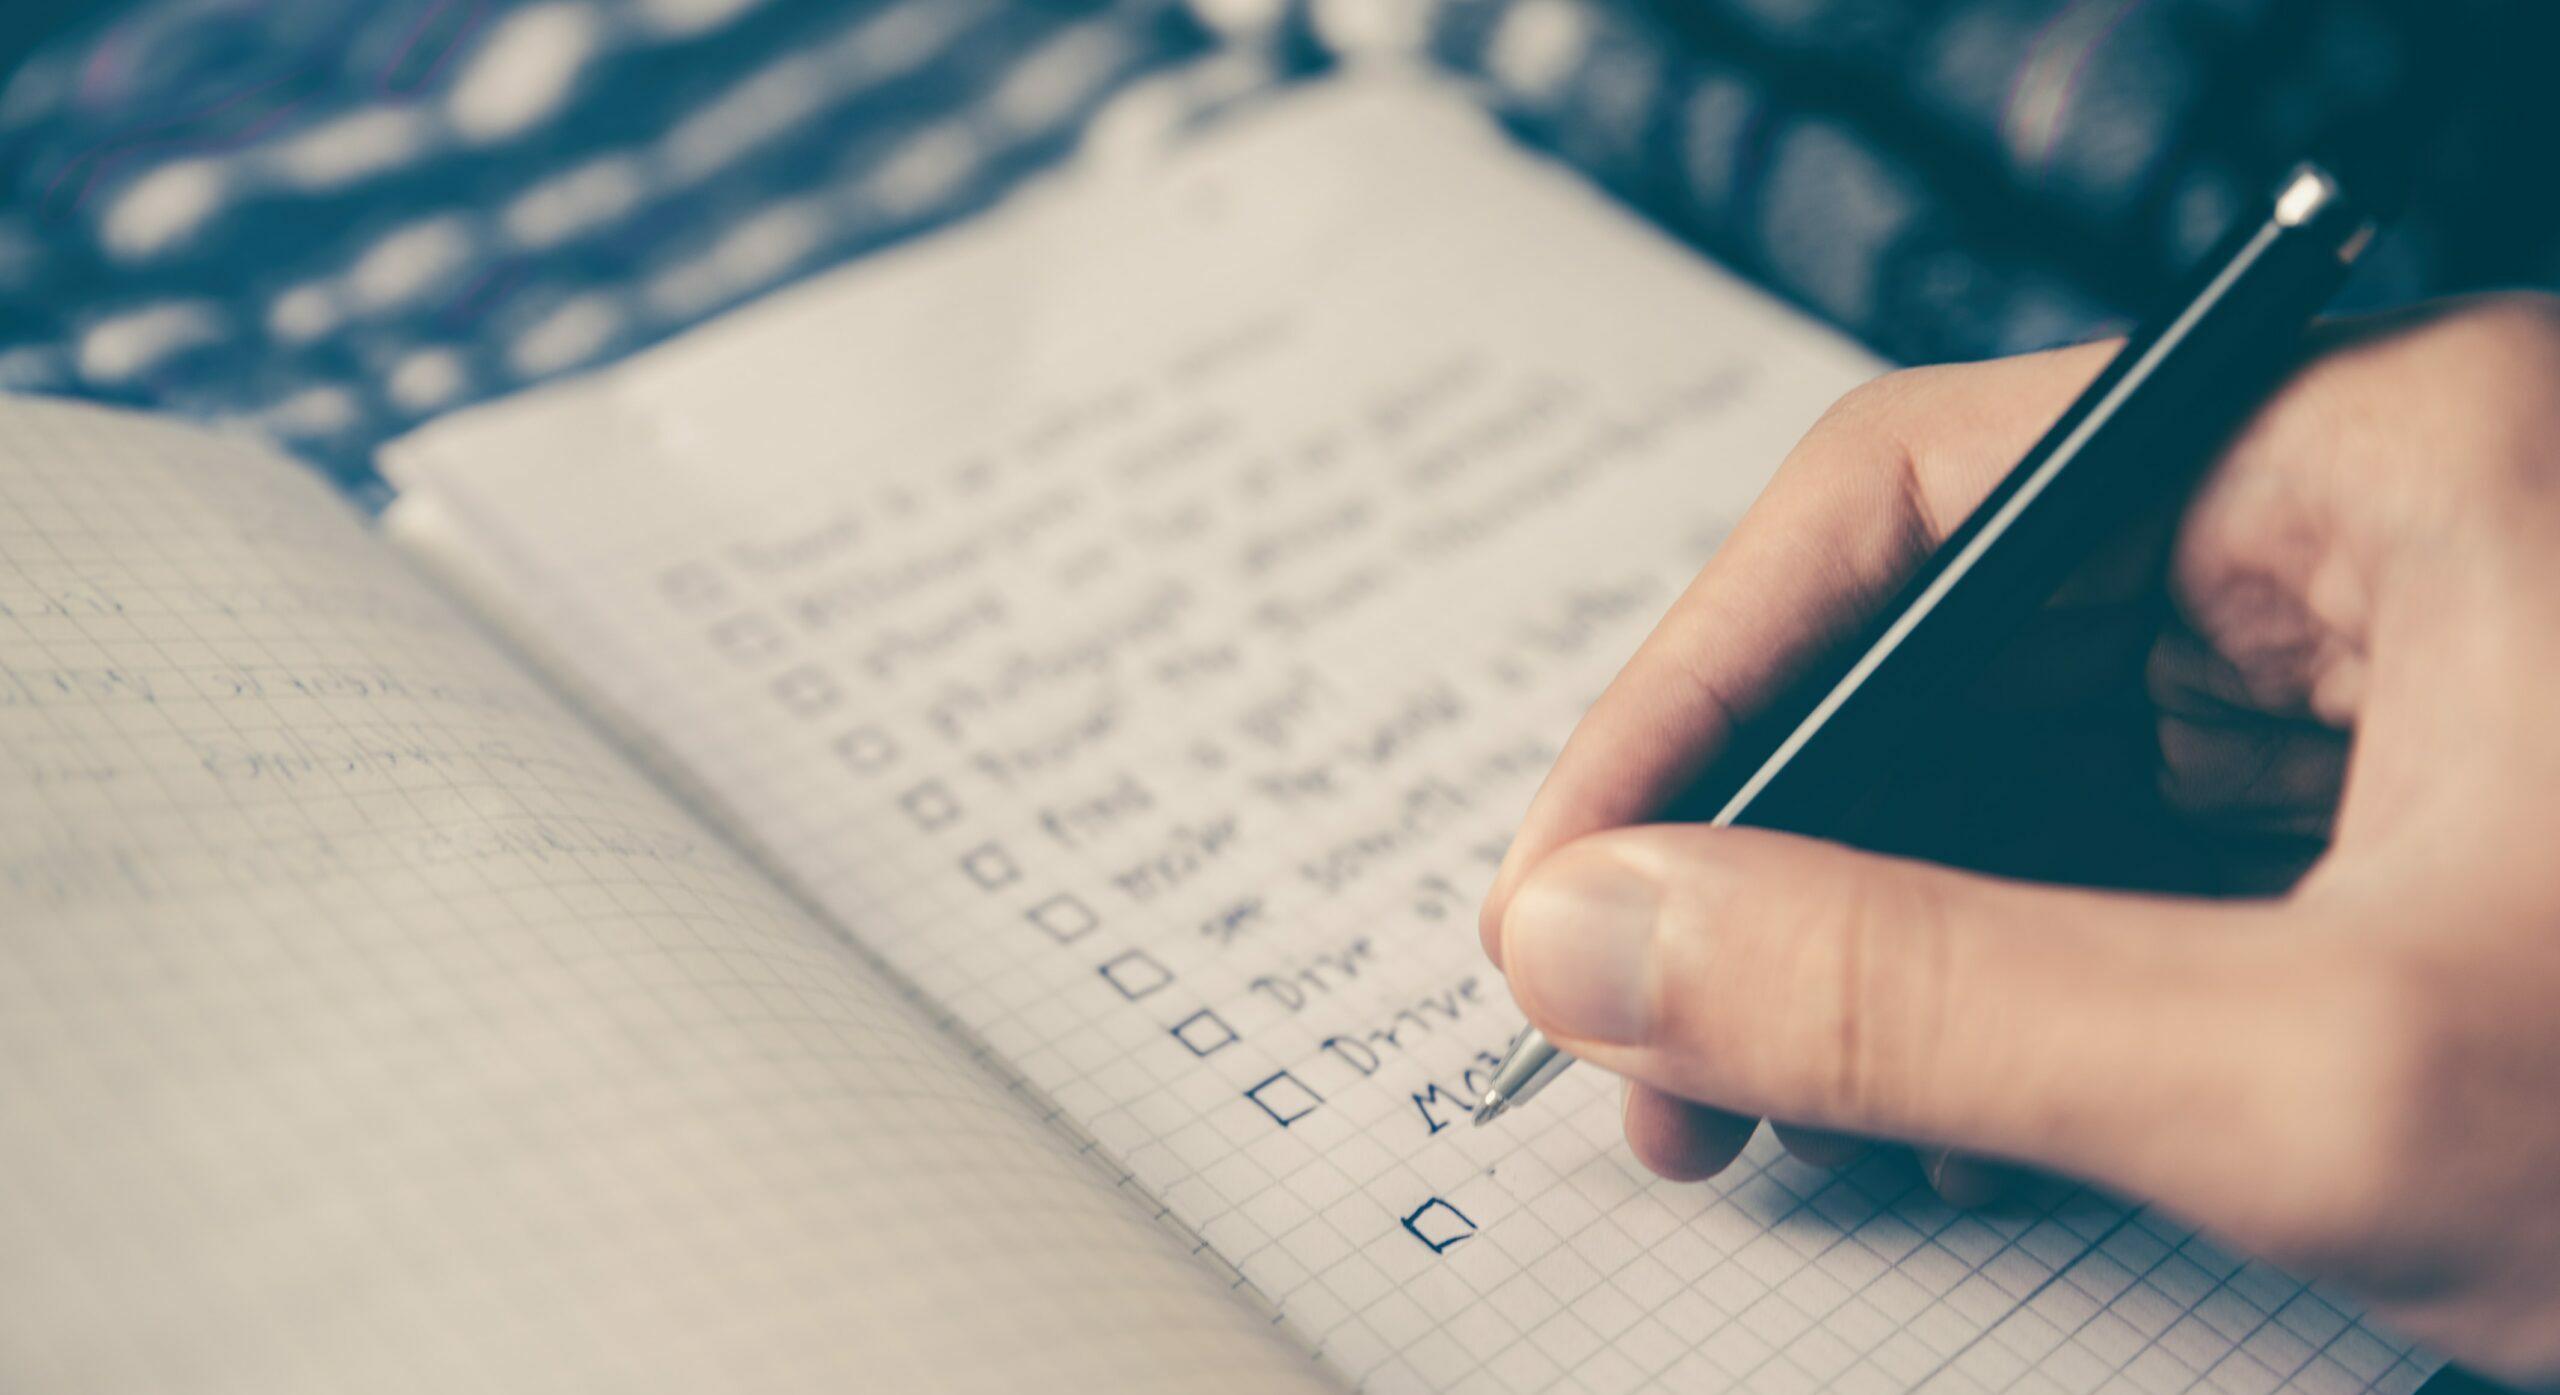 hand writing checklist in notebook